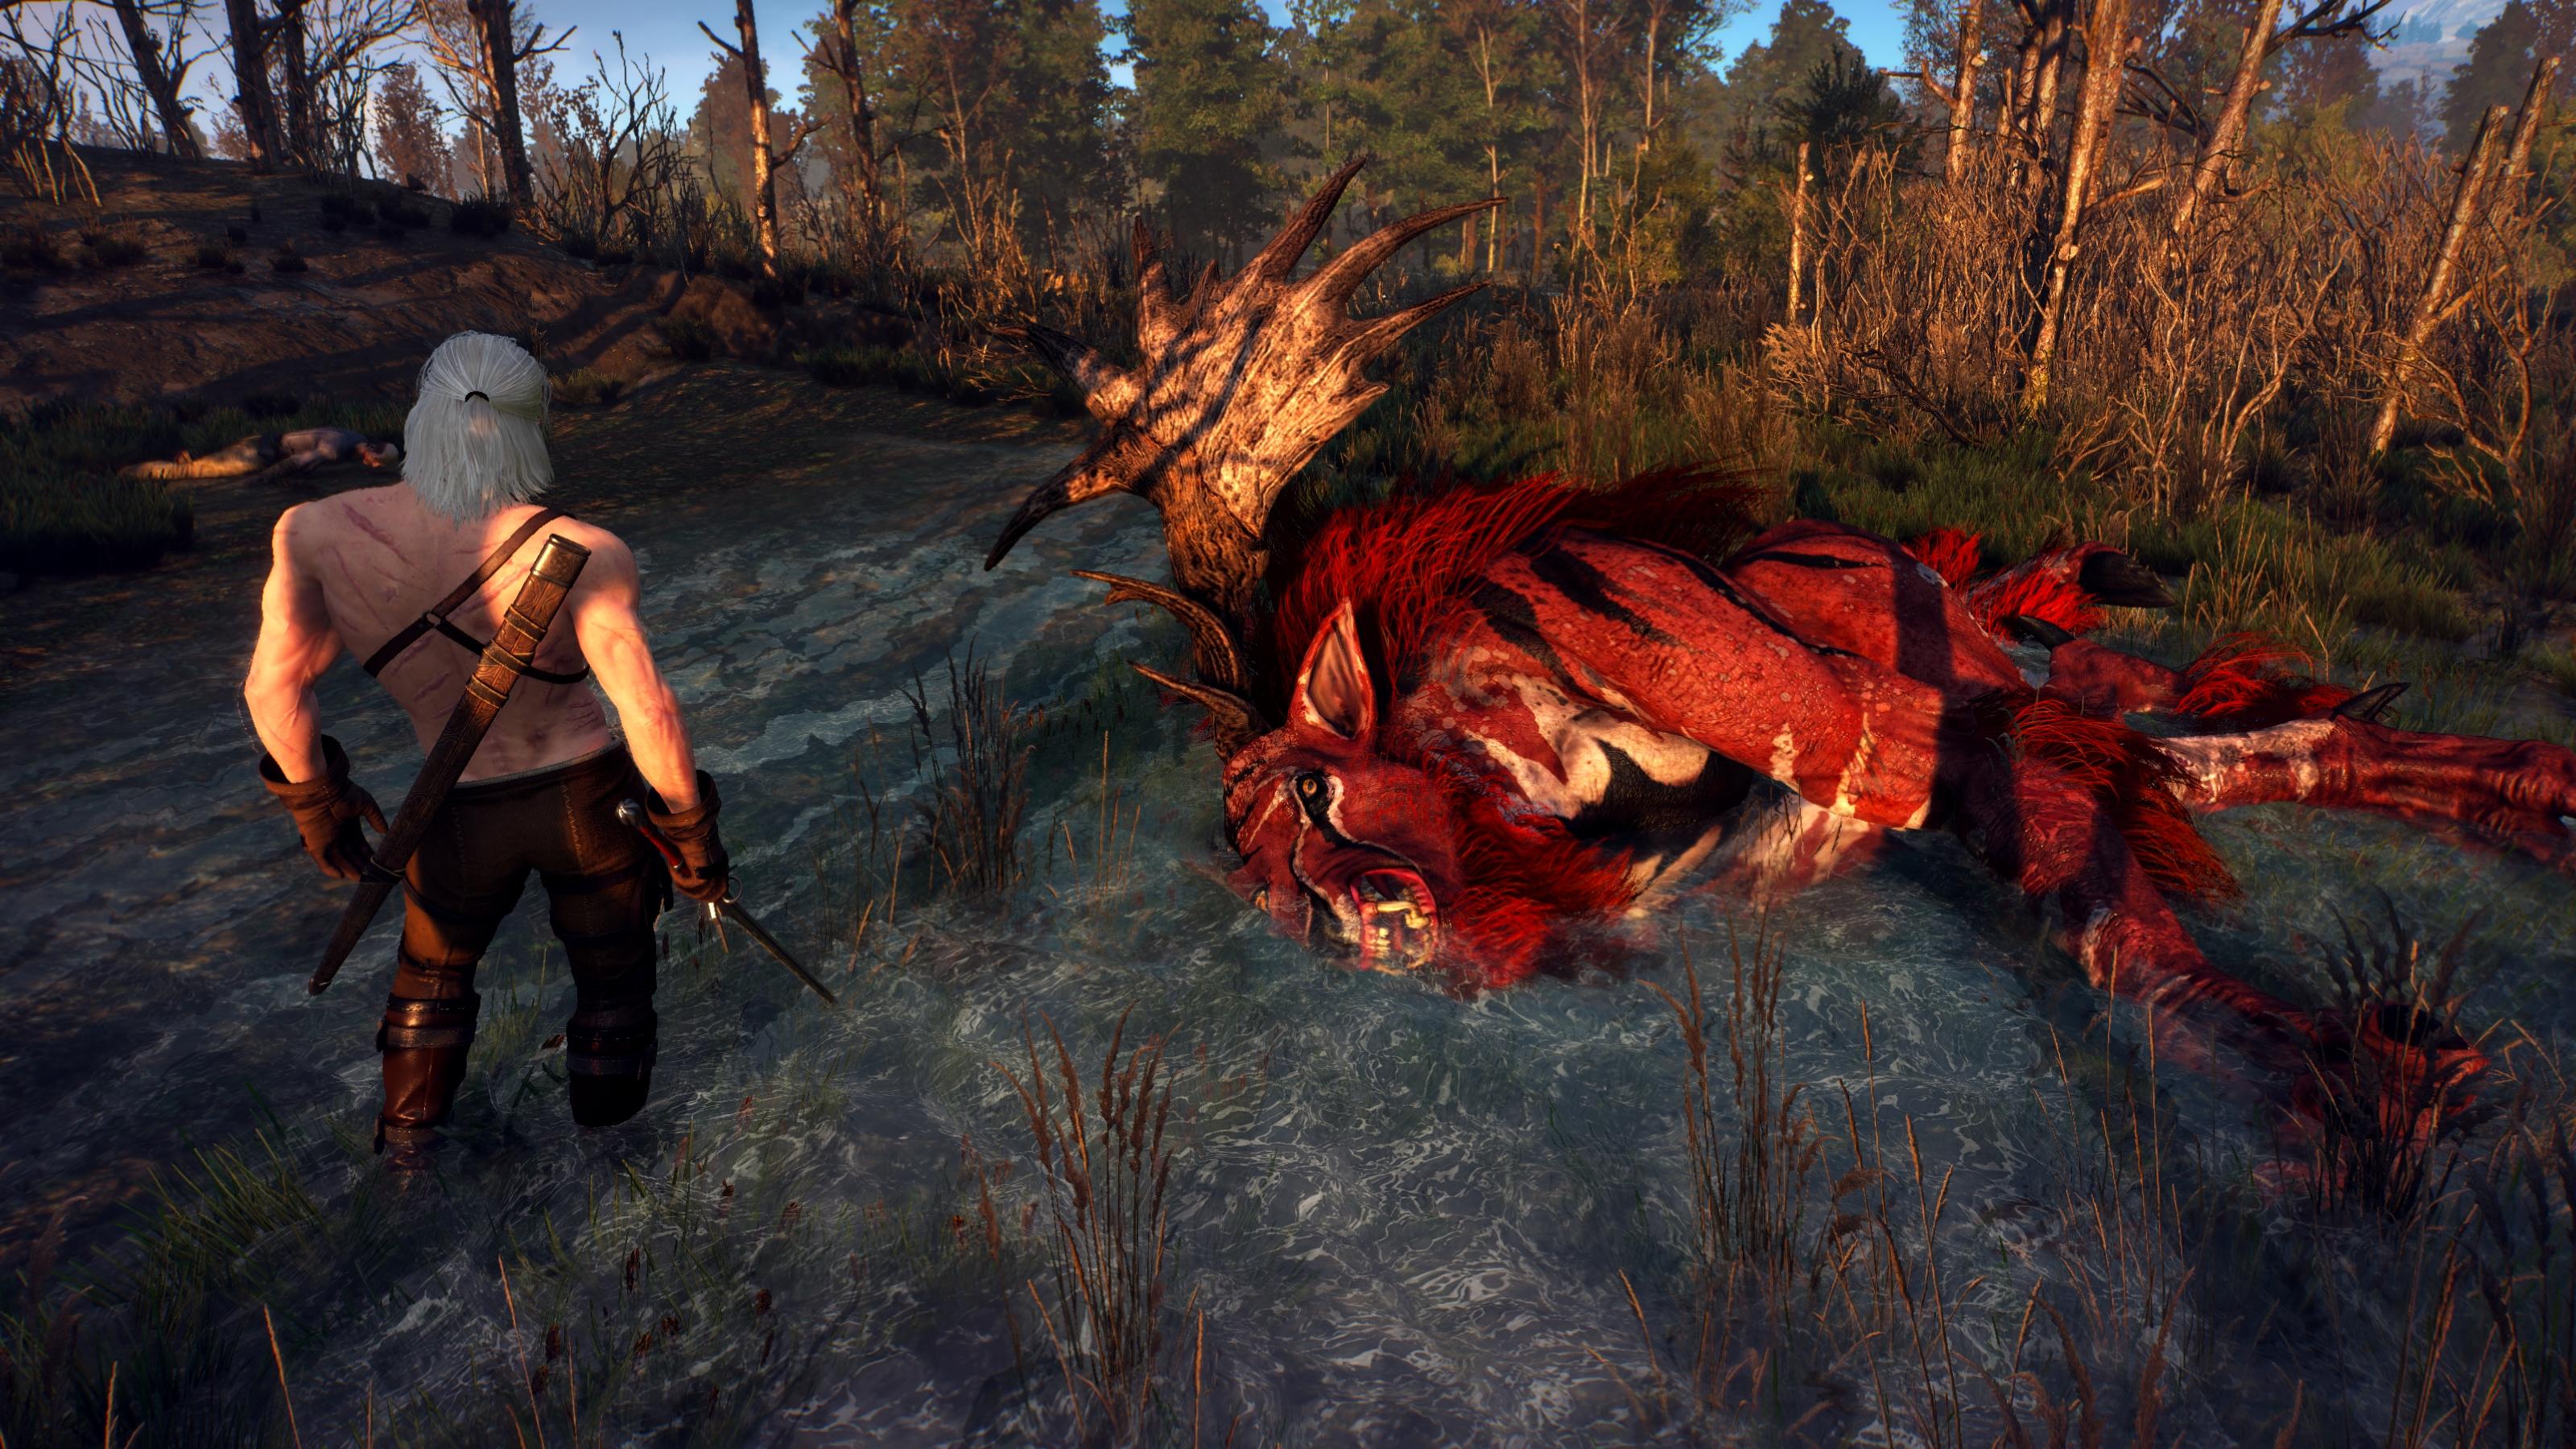 main - Witcher 3: Wild Hunt, the